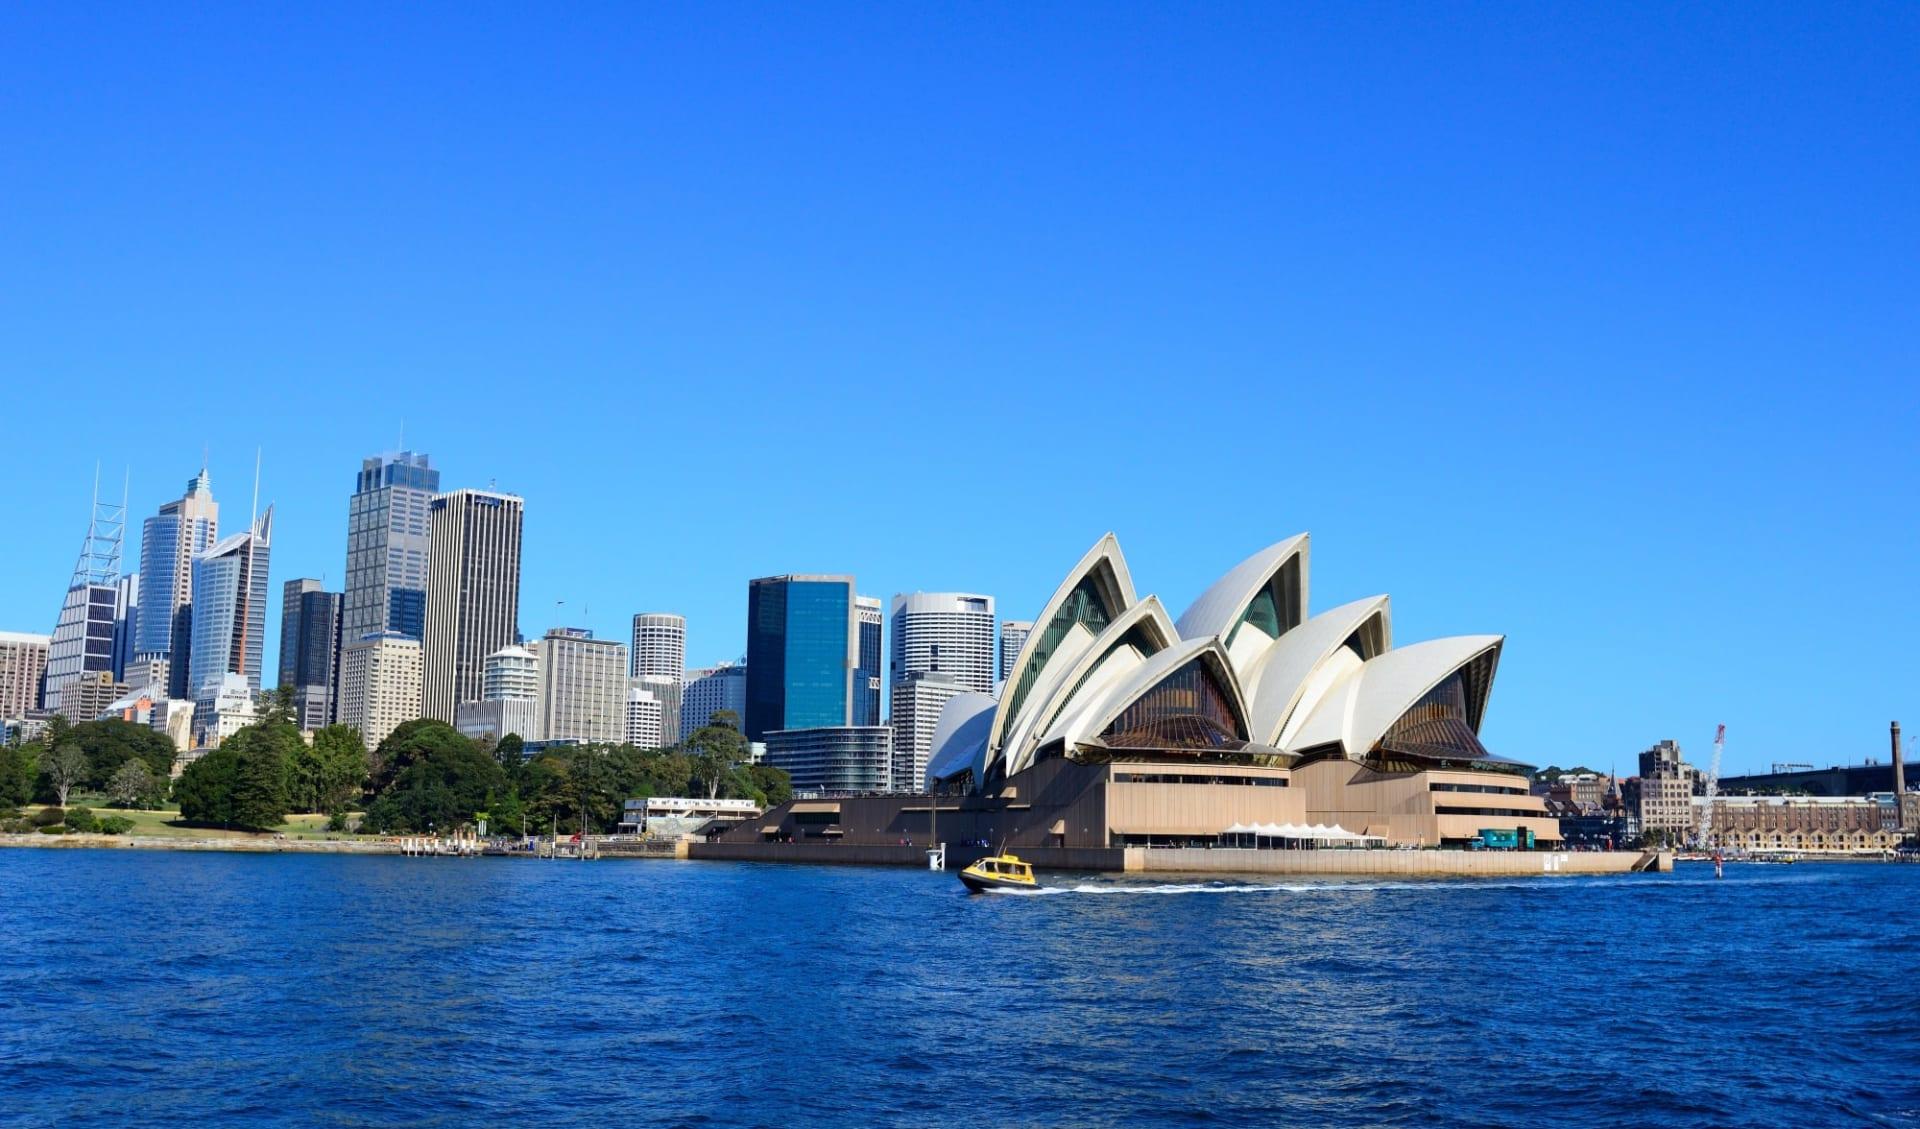 Pacific Coast Touring Route ab Sydney: Australia - New South Wales - Sydney - City Skyline - Shutterstock Jason Ho